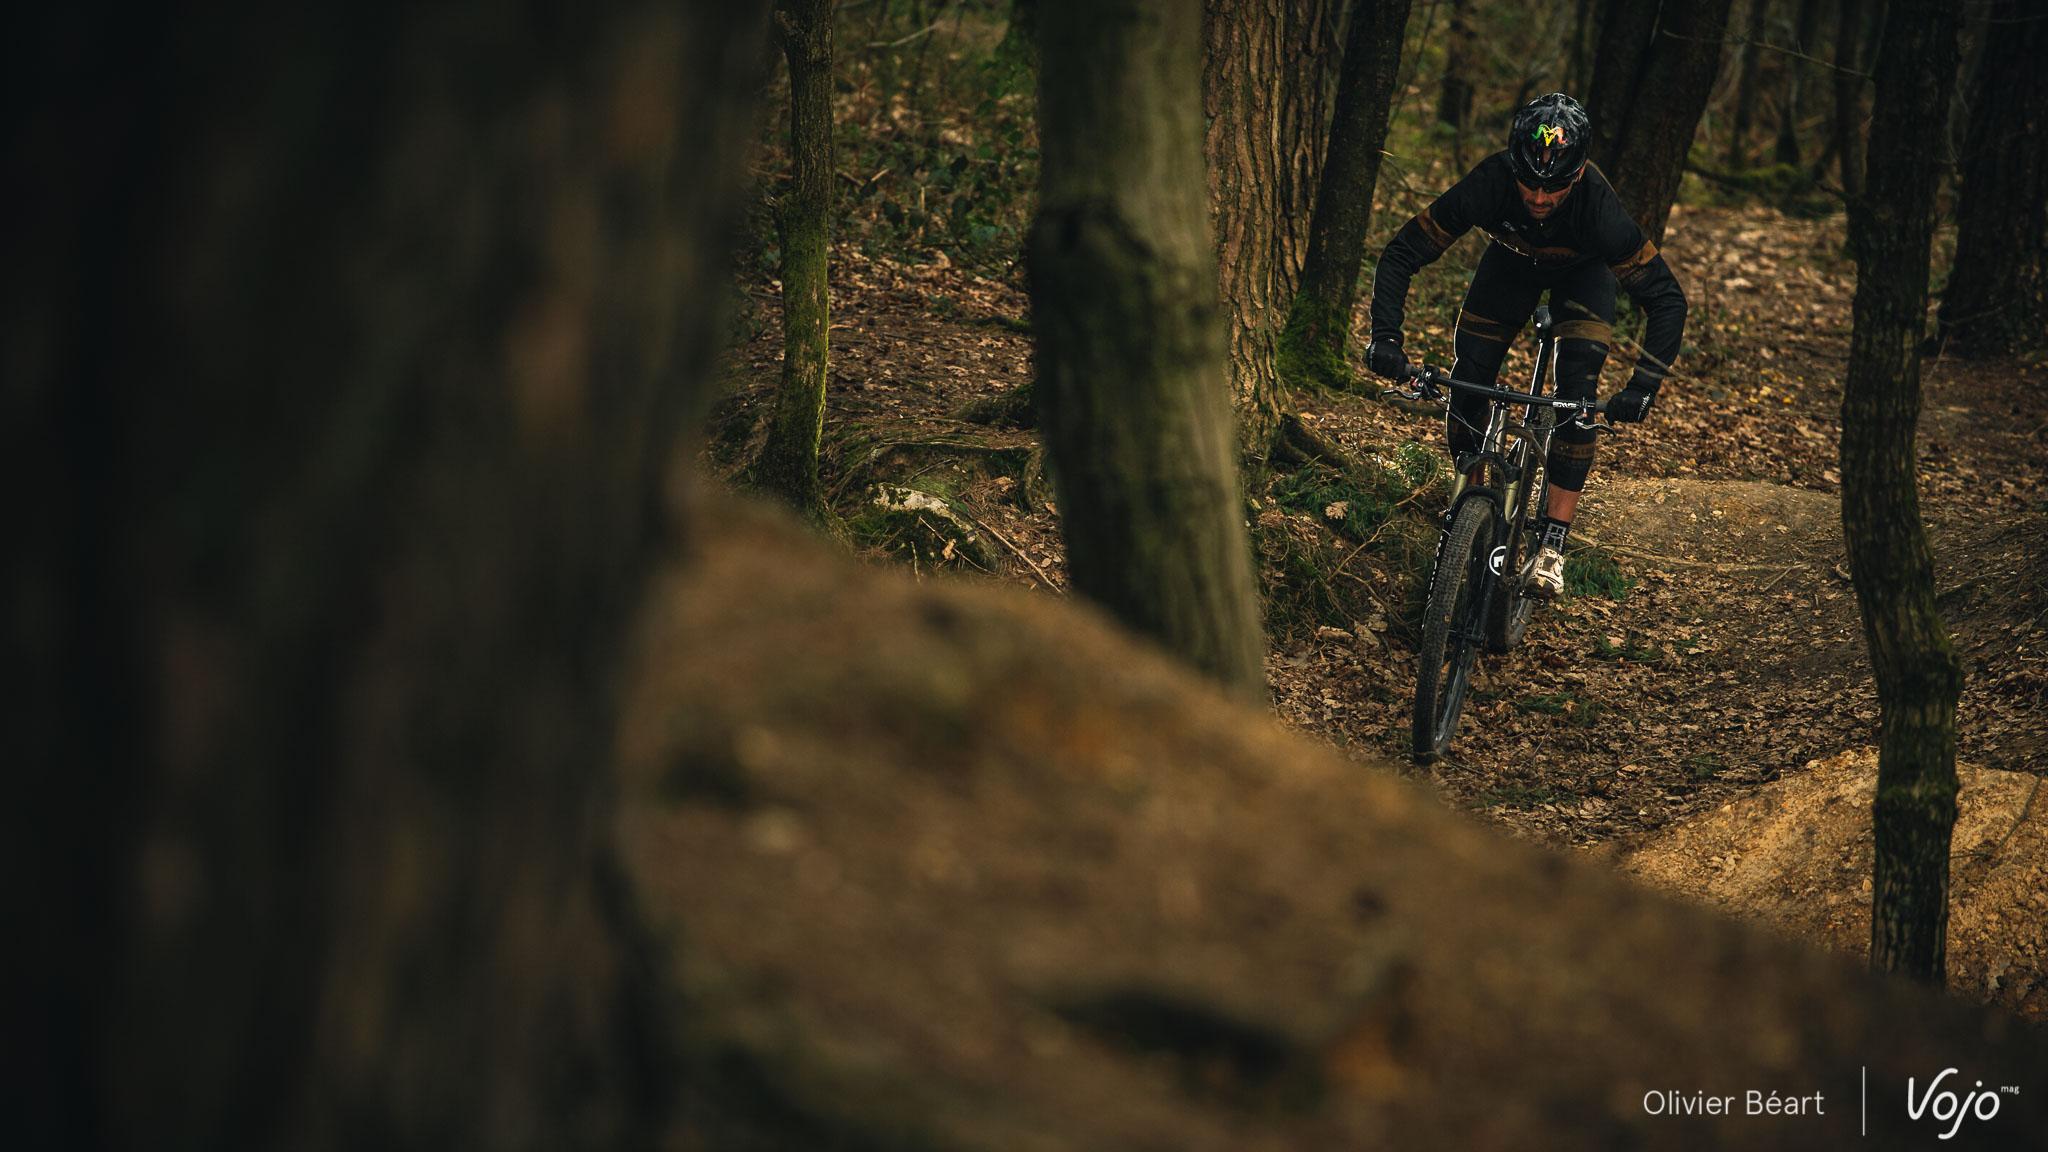 cycles_leon_decouverte_copyright_obeart_vojomag-74